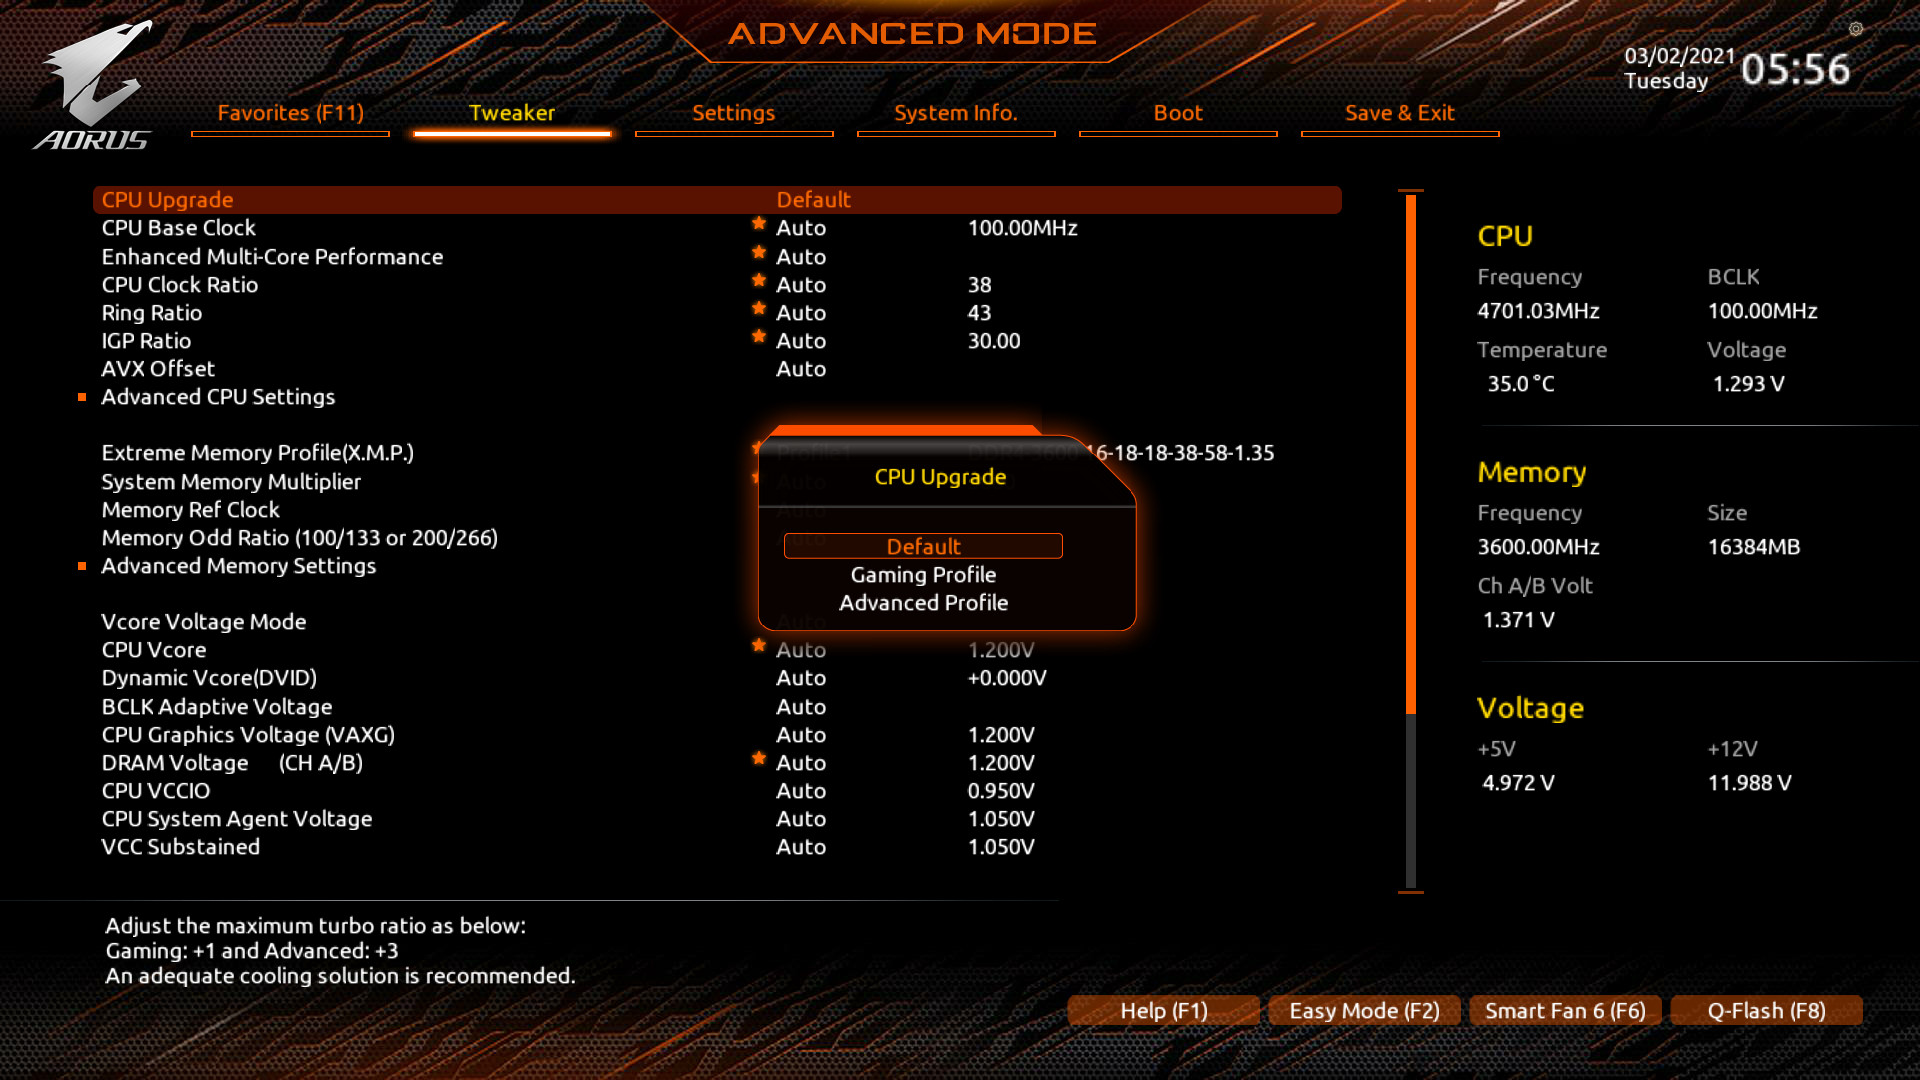 210302055630 CPU Upgrade